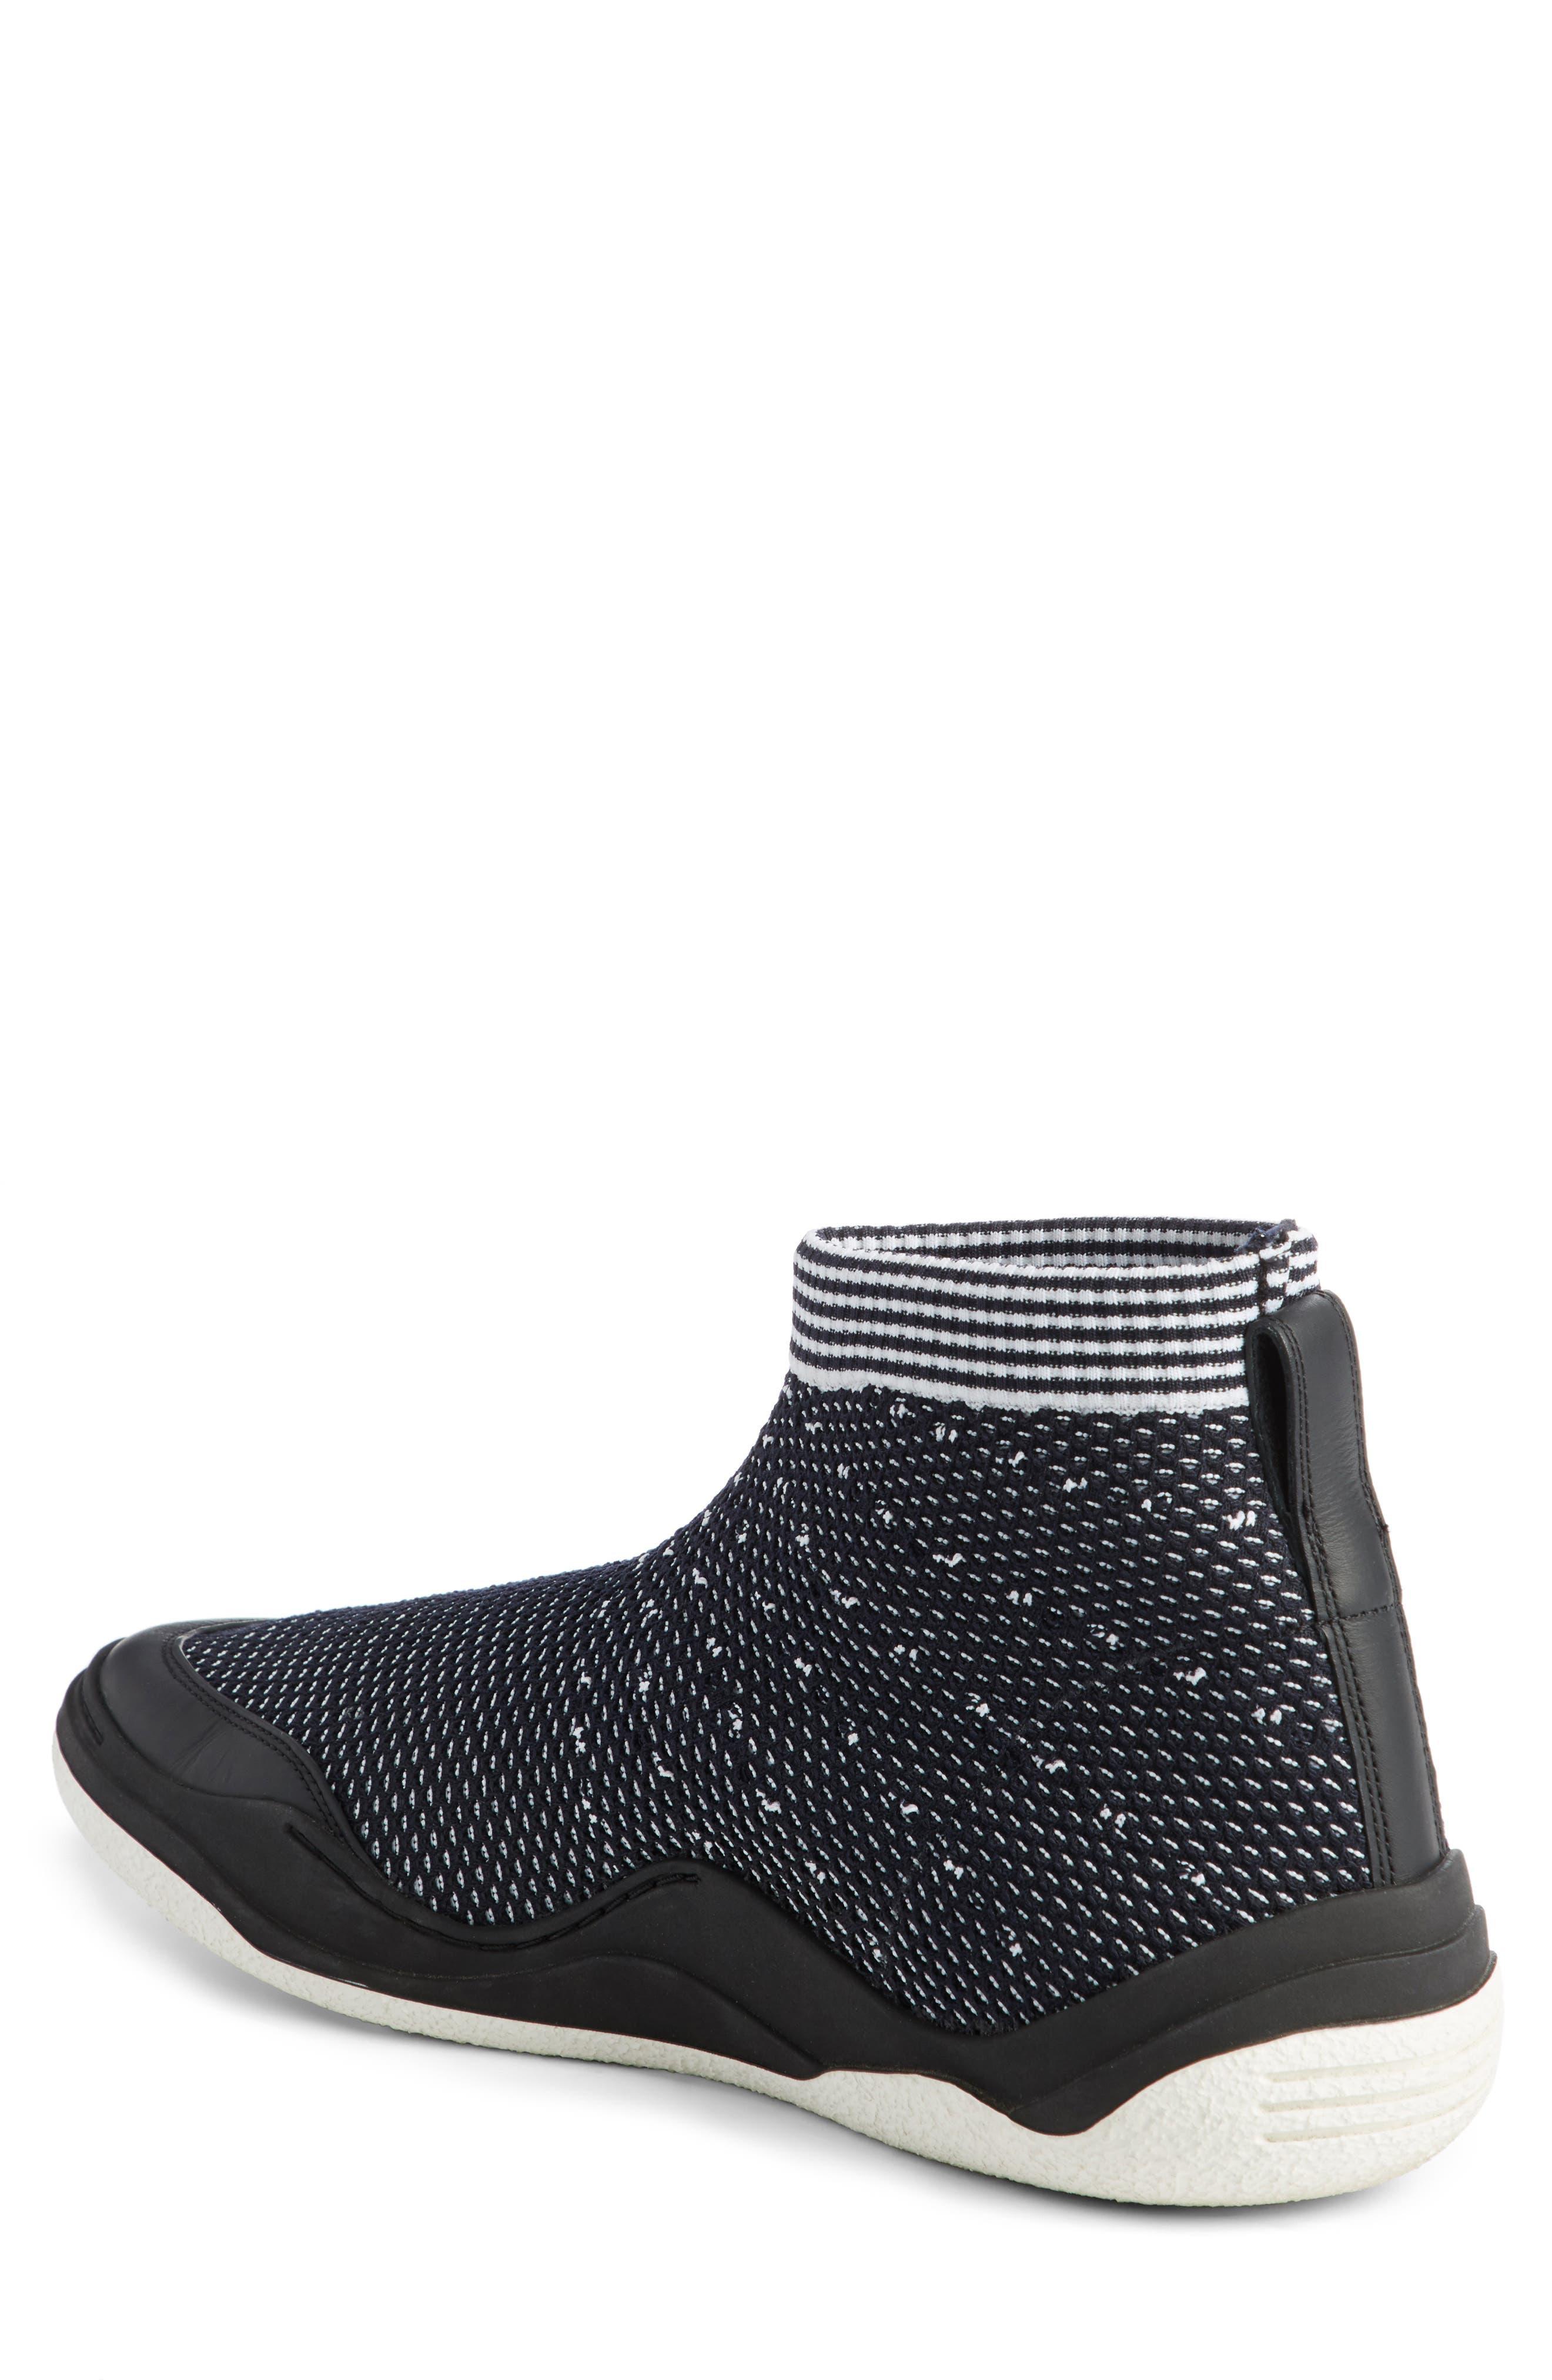 Alternate Image 2  - Lanvin Knit Sneaker (Men)